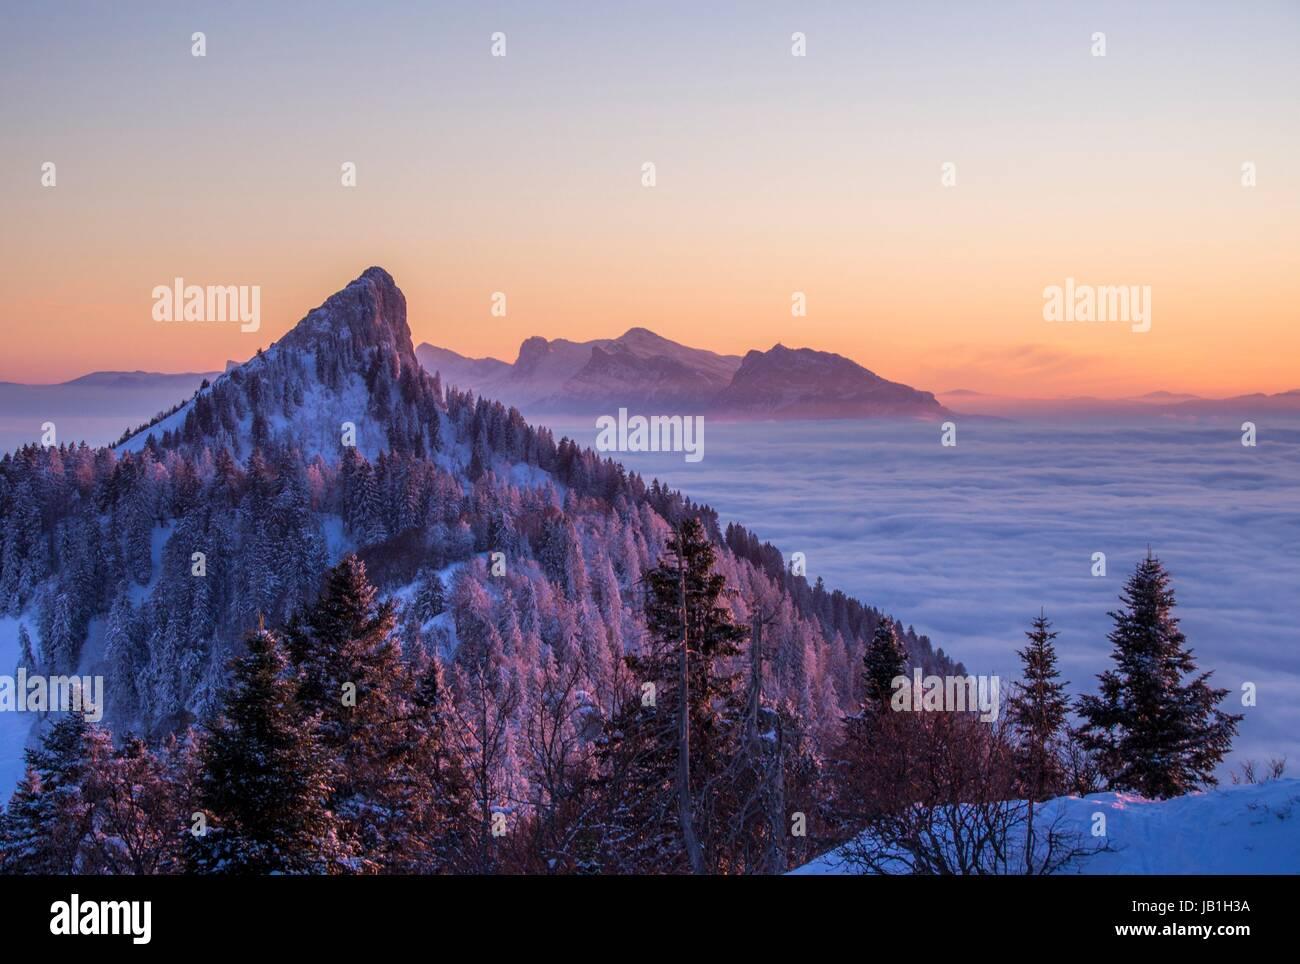 Sunset view 'La Grande Sûre' Chartreuse, FRANCE - Stock Image